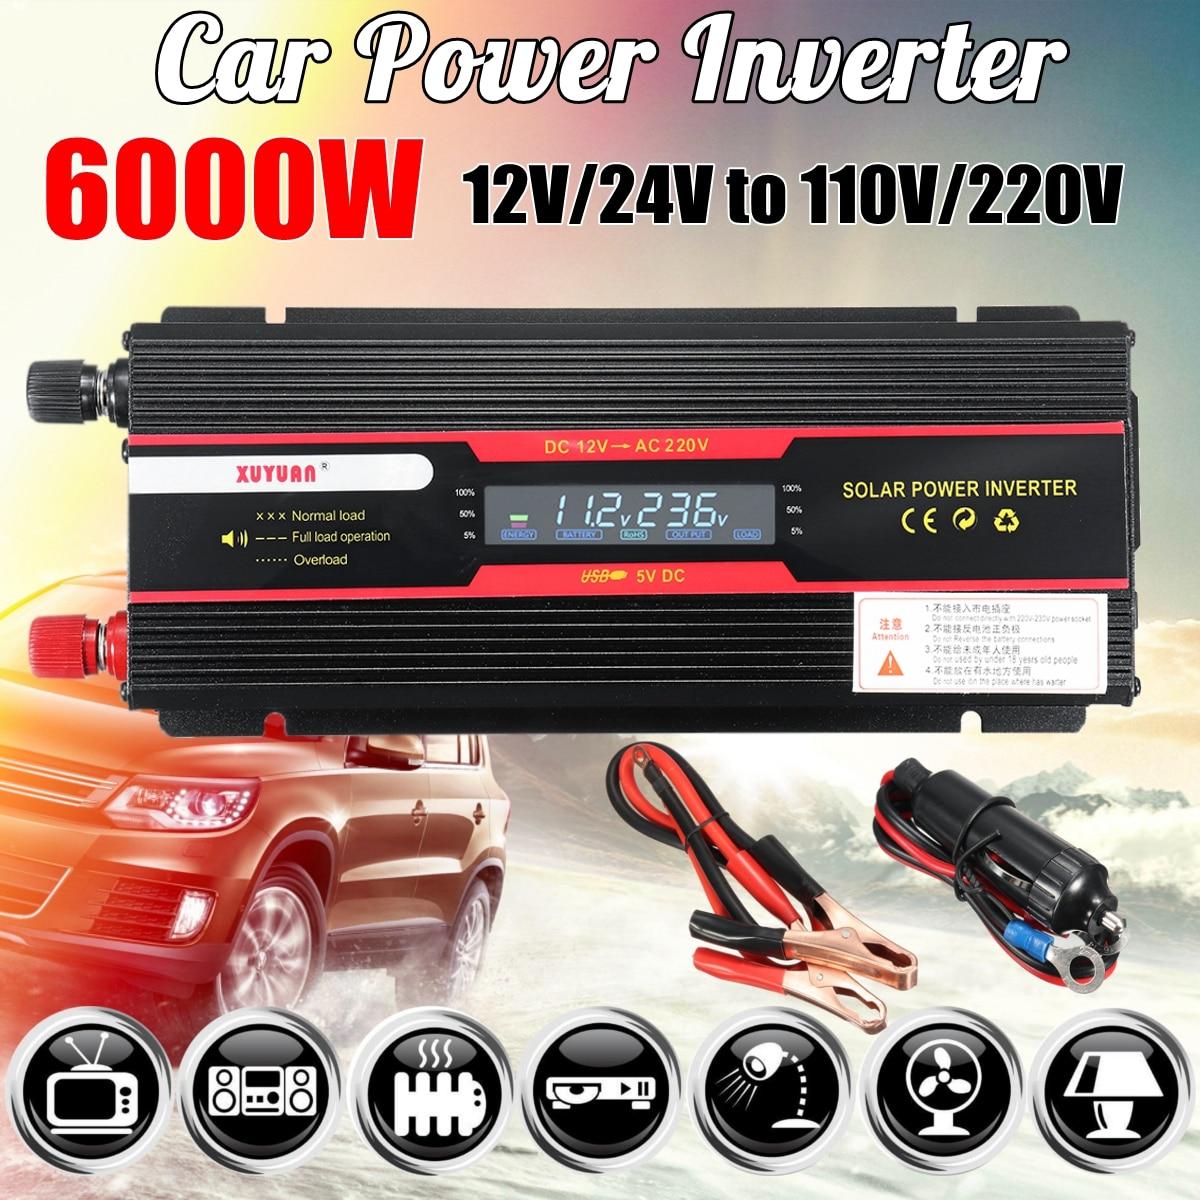 Onduleur de voiture 12 V 220 V 6000 W Pe ak convertisseur de tension convertisseur de tension transformateur 12 V/24 V à 110 V/220 V Inversor + écran LCD